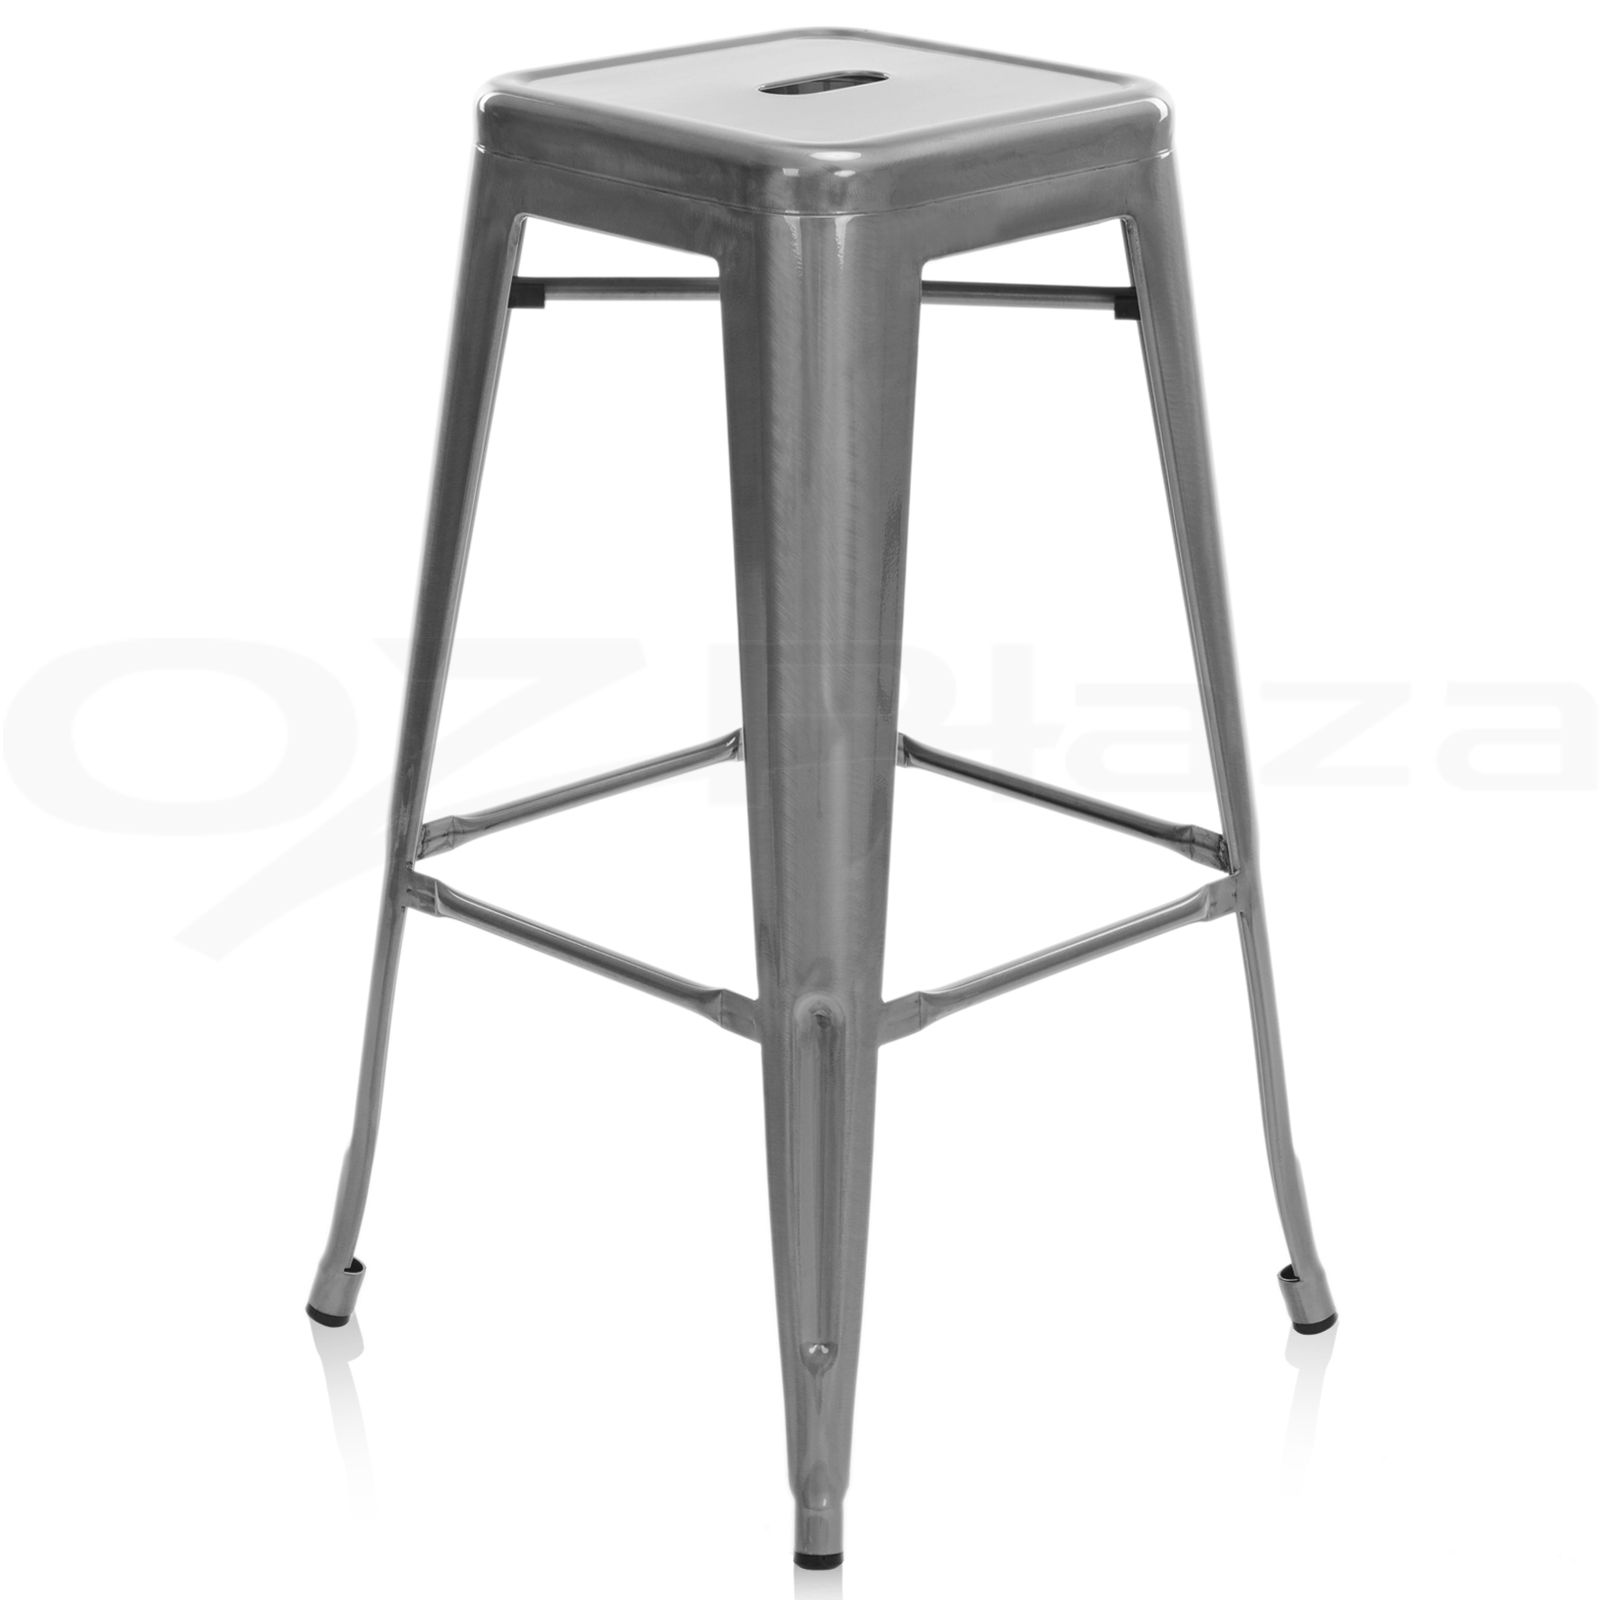 4x replica xavier tolix bar stool metal steel kitchen cafe - Tolix bar stool replica ...